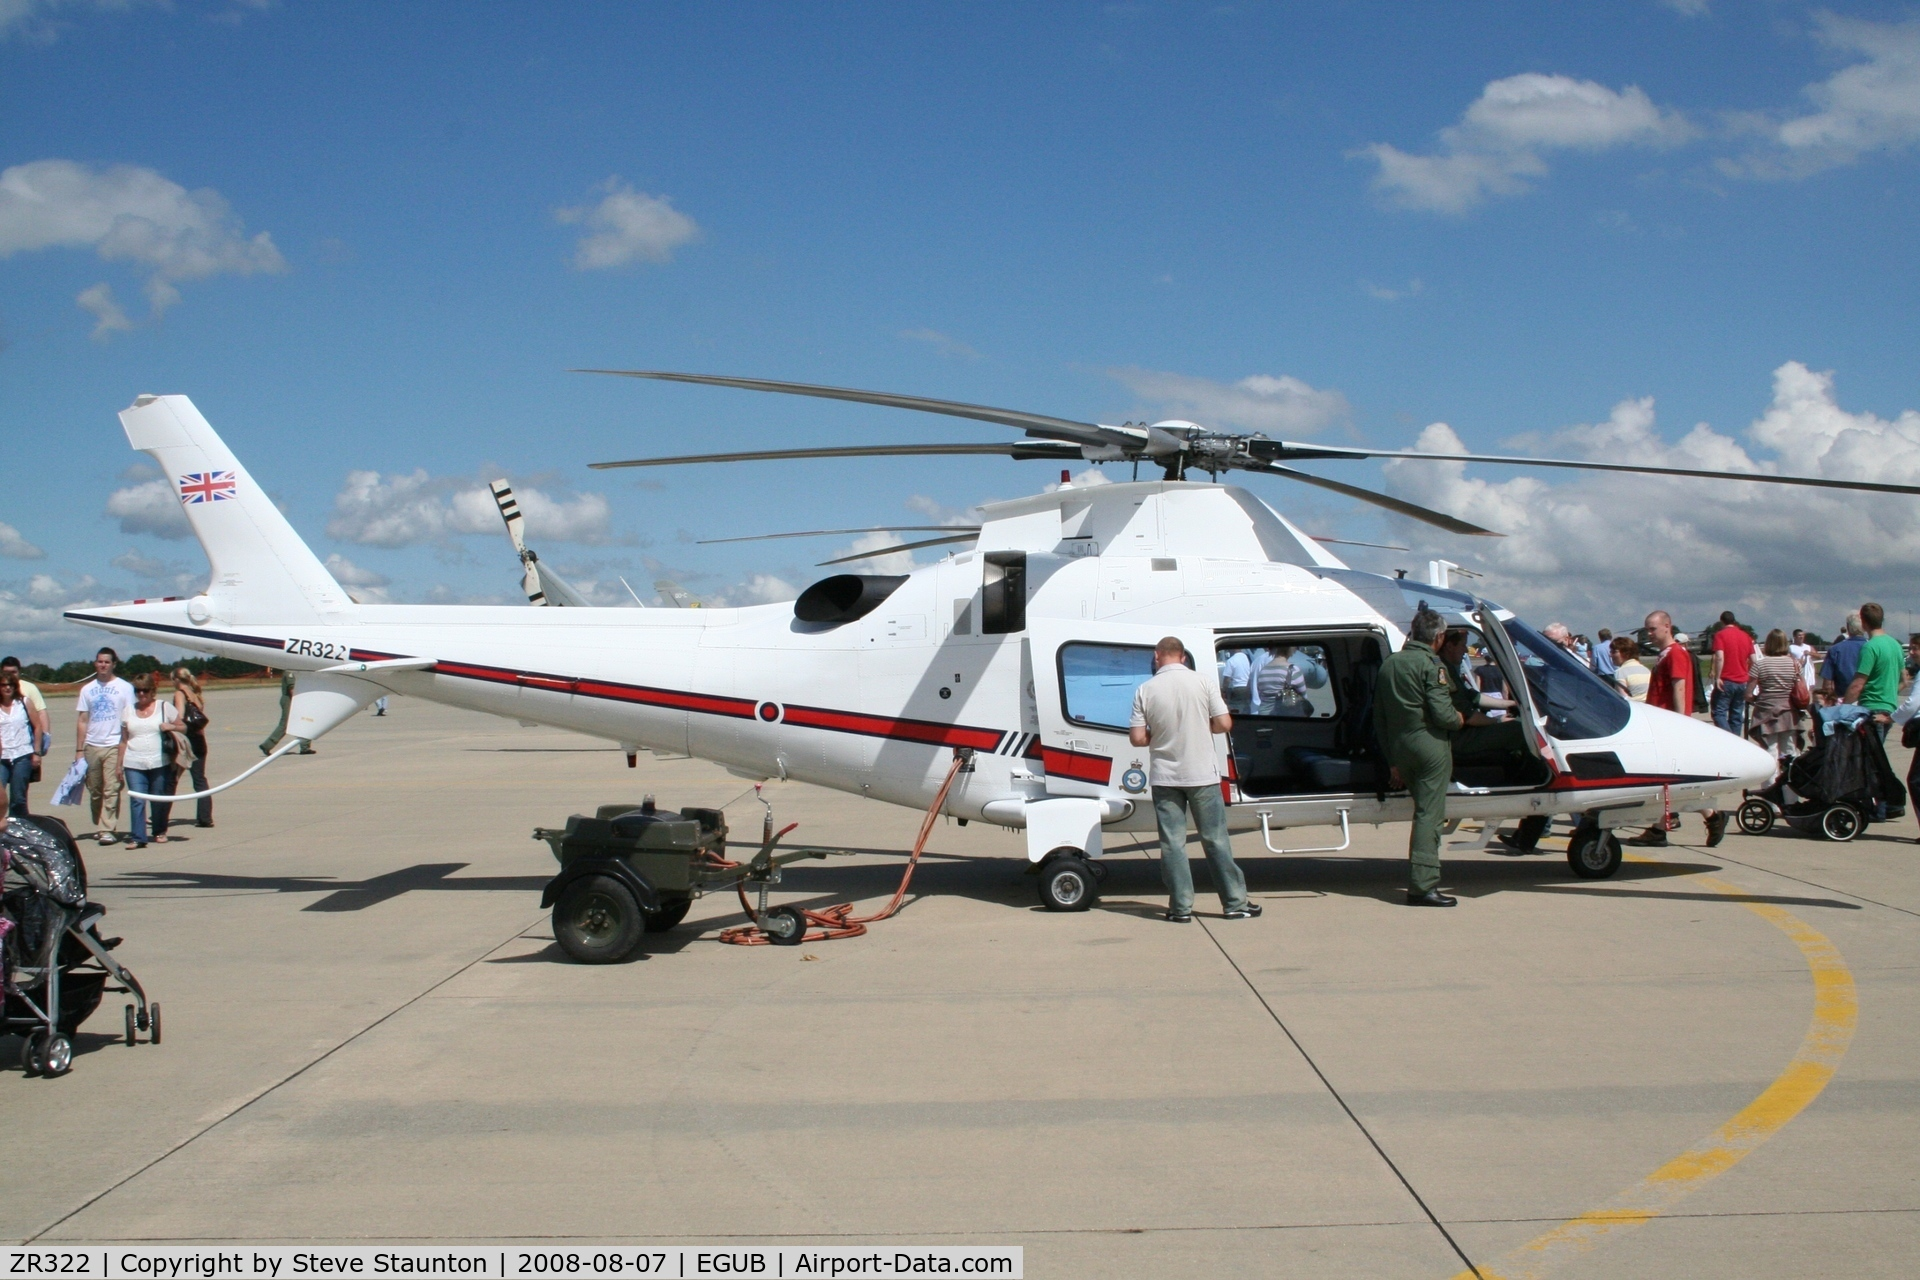 ZR322, 2006 Agusta A-109E Power C/N 11664, RAF Benson Families Day, RAF Benson, Oxfordshire, England - August 2008